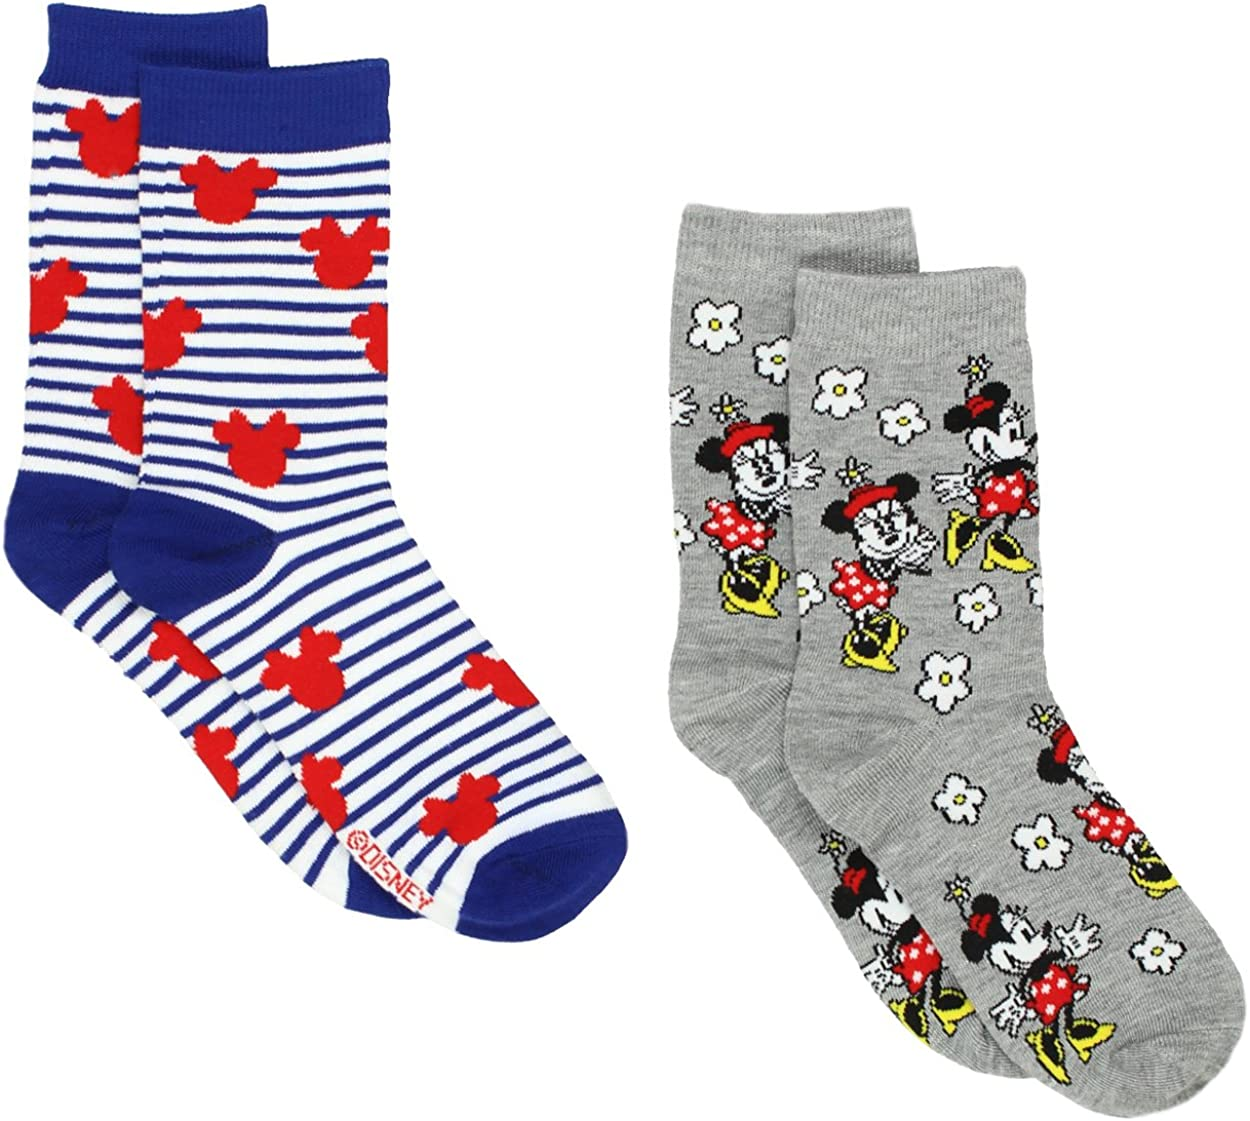 Minnie Mouse Womens 2 pack Socks (Big Kid/Teen/Adult)